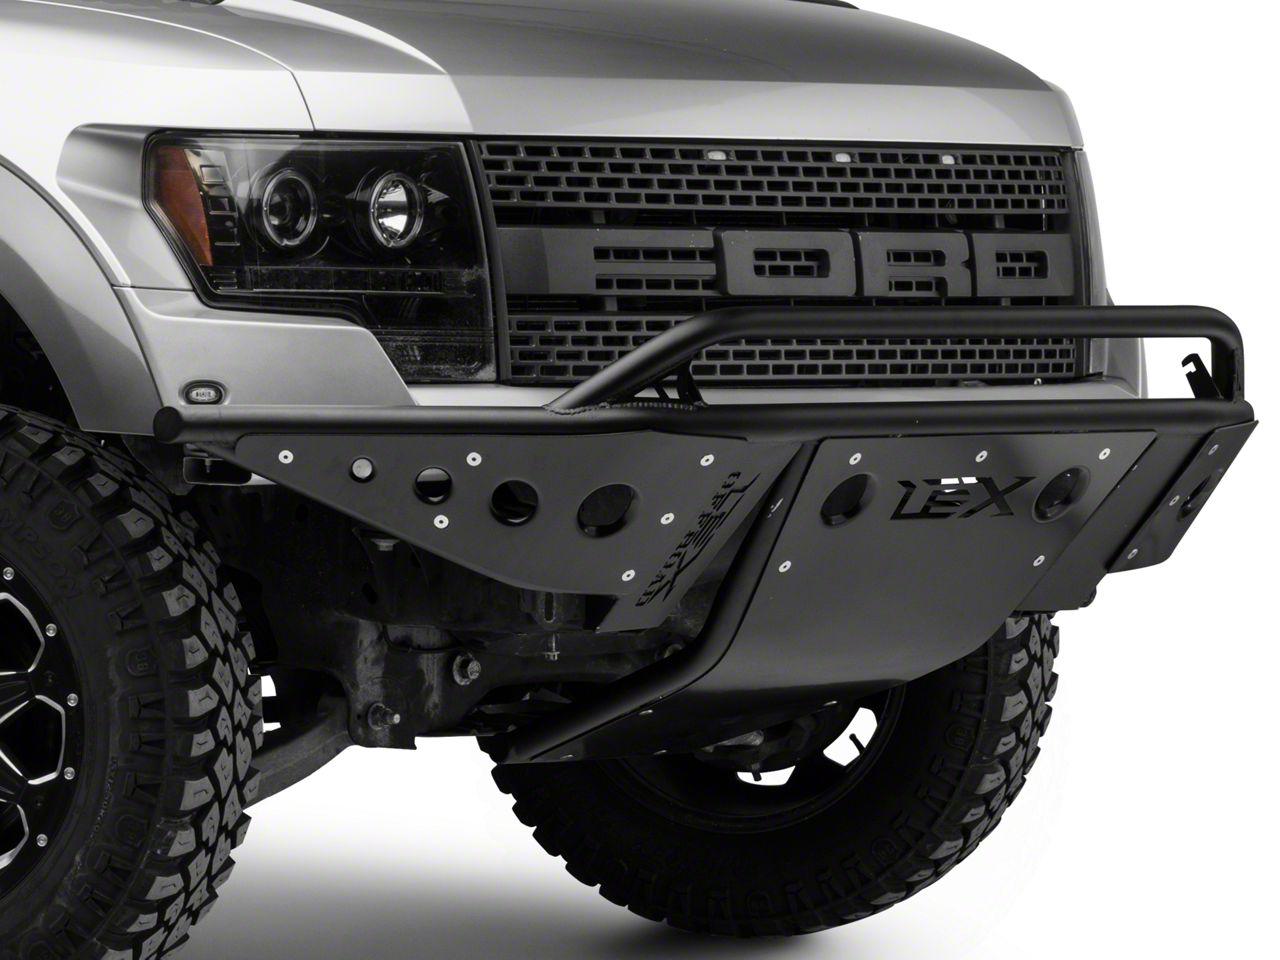 LEX Motorsports Dimple Gen 1 Front Bumper (10-14 F-150 Raptor)